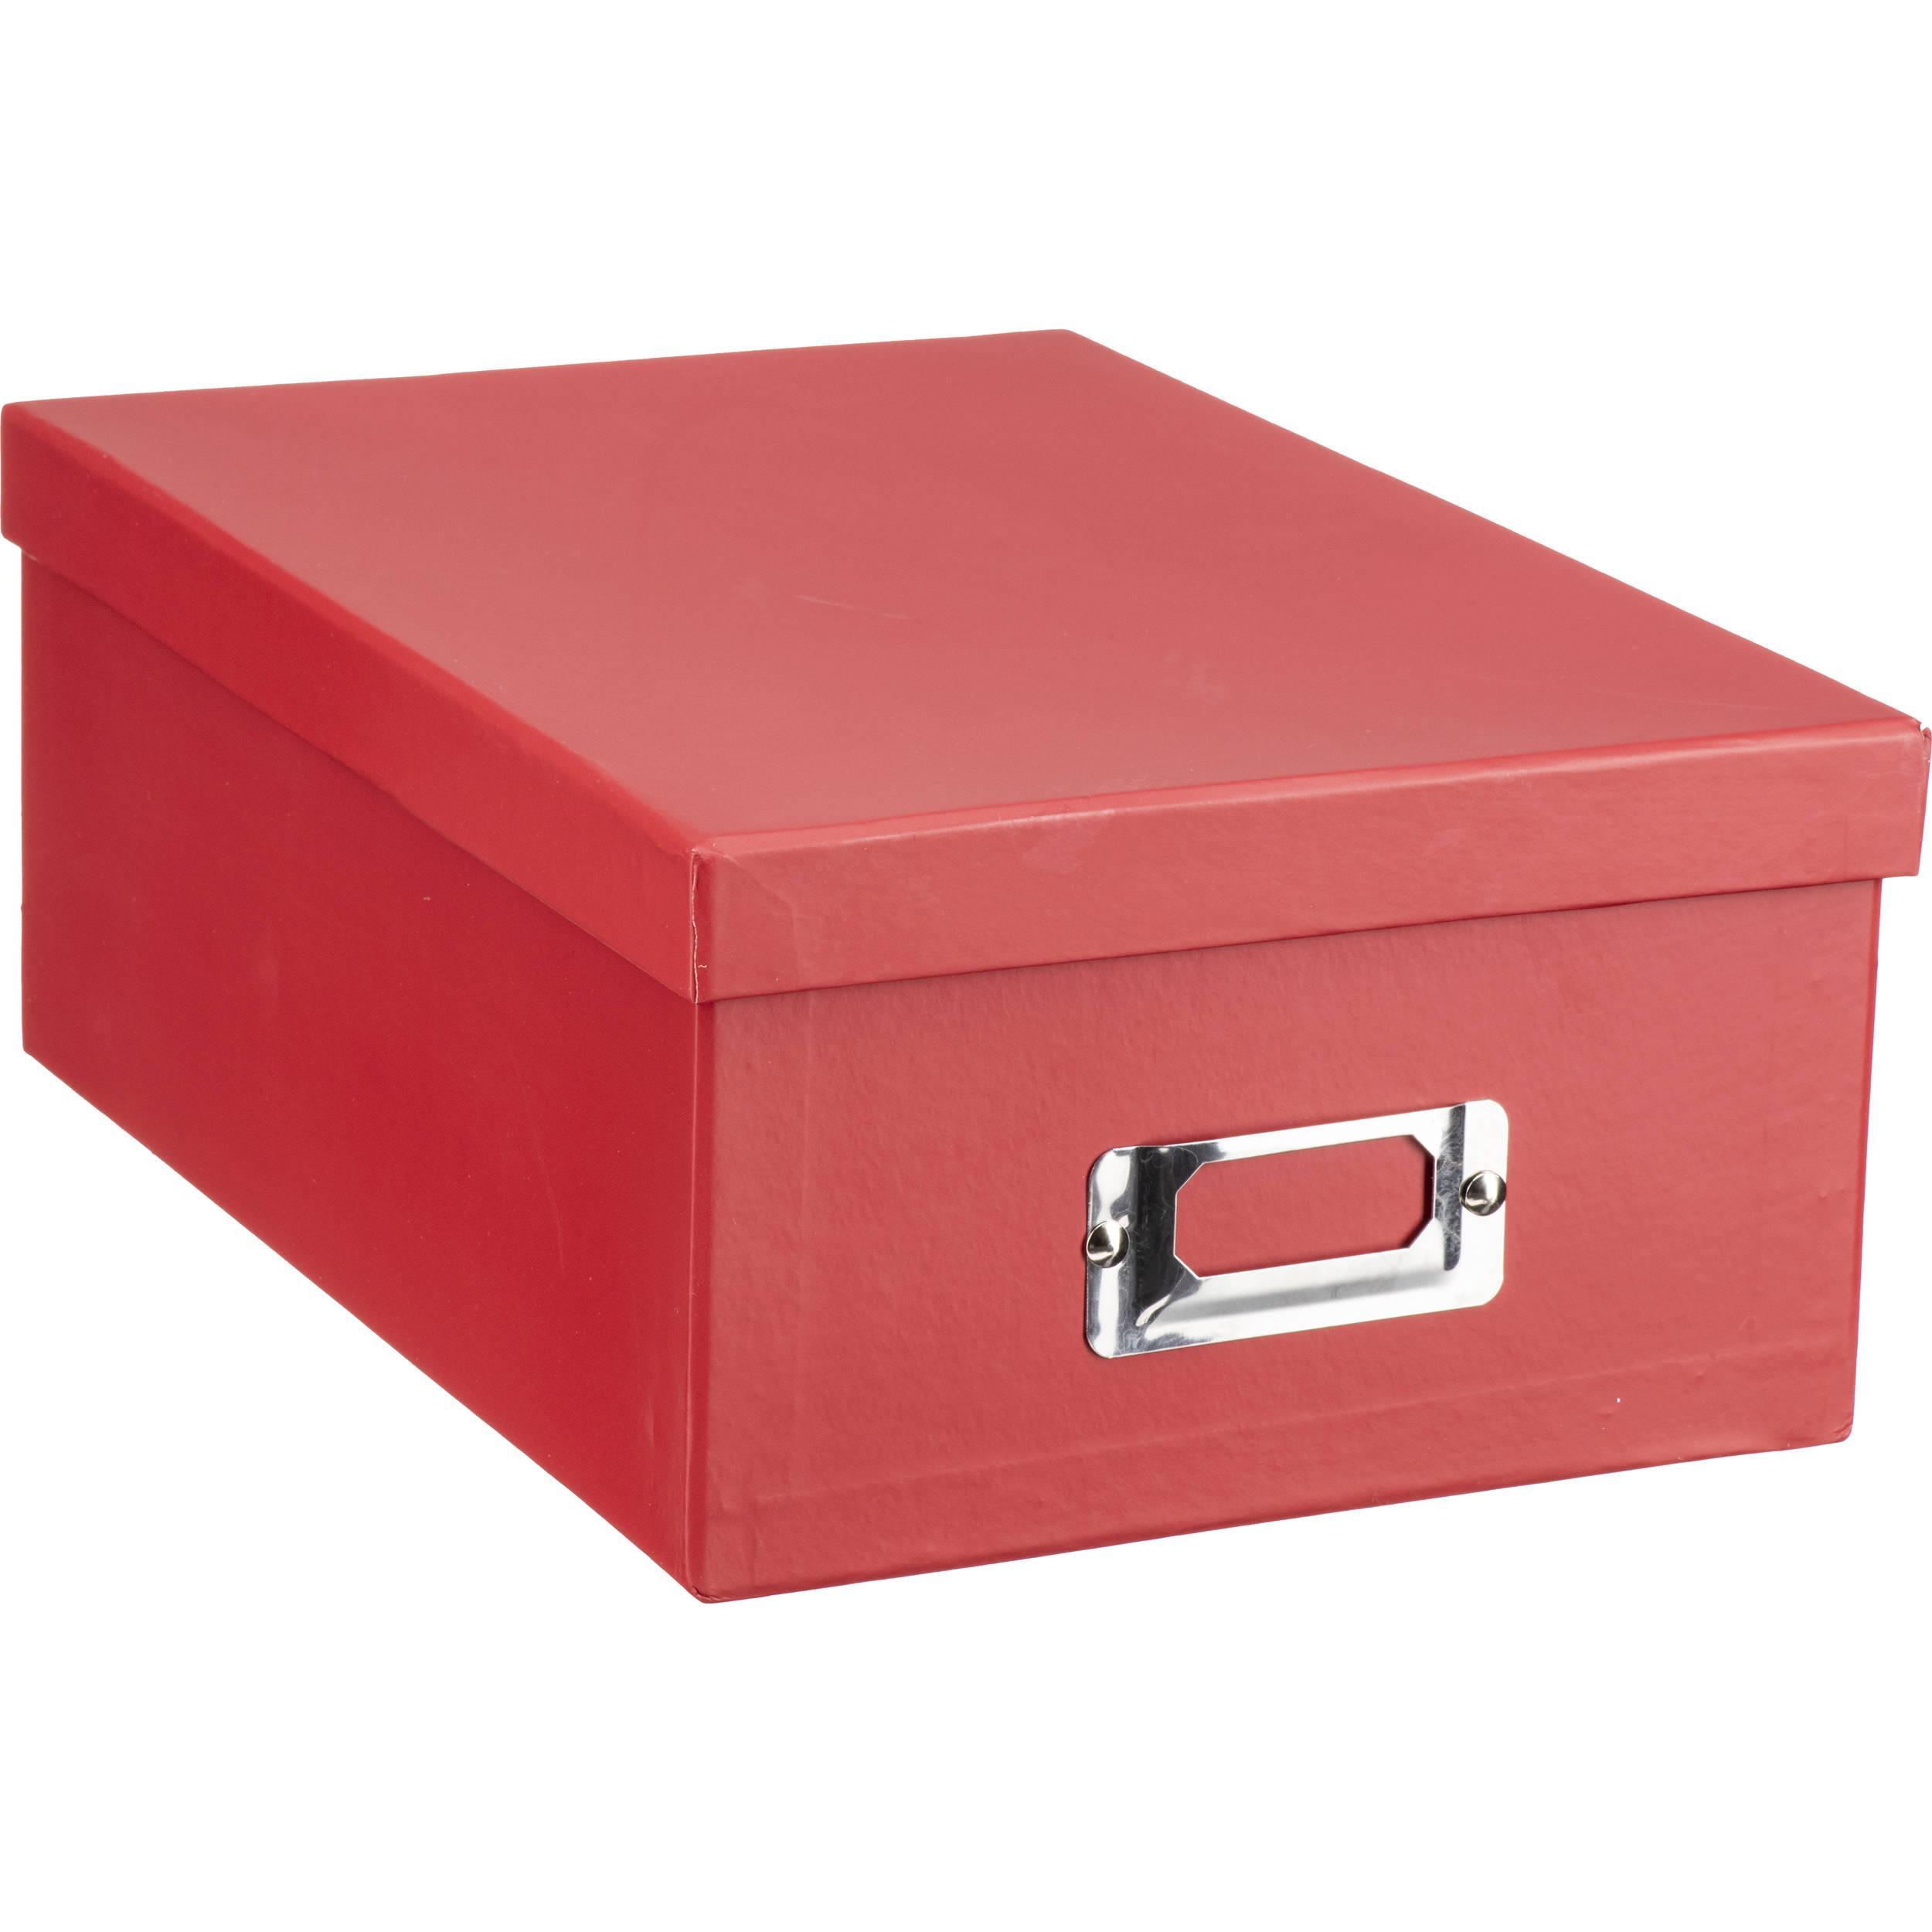 Pioneer Photo Albums Photo Storage Box (Bright Red)